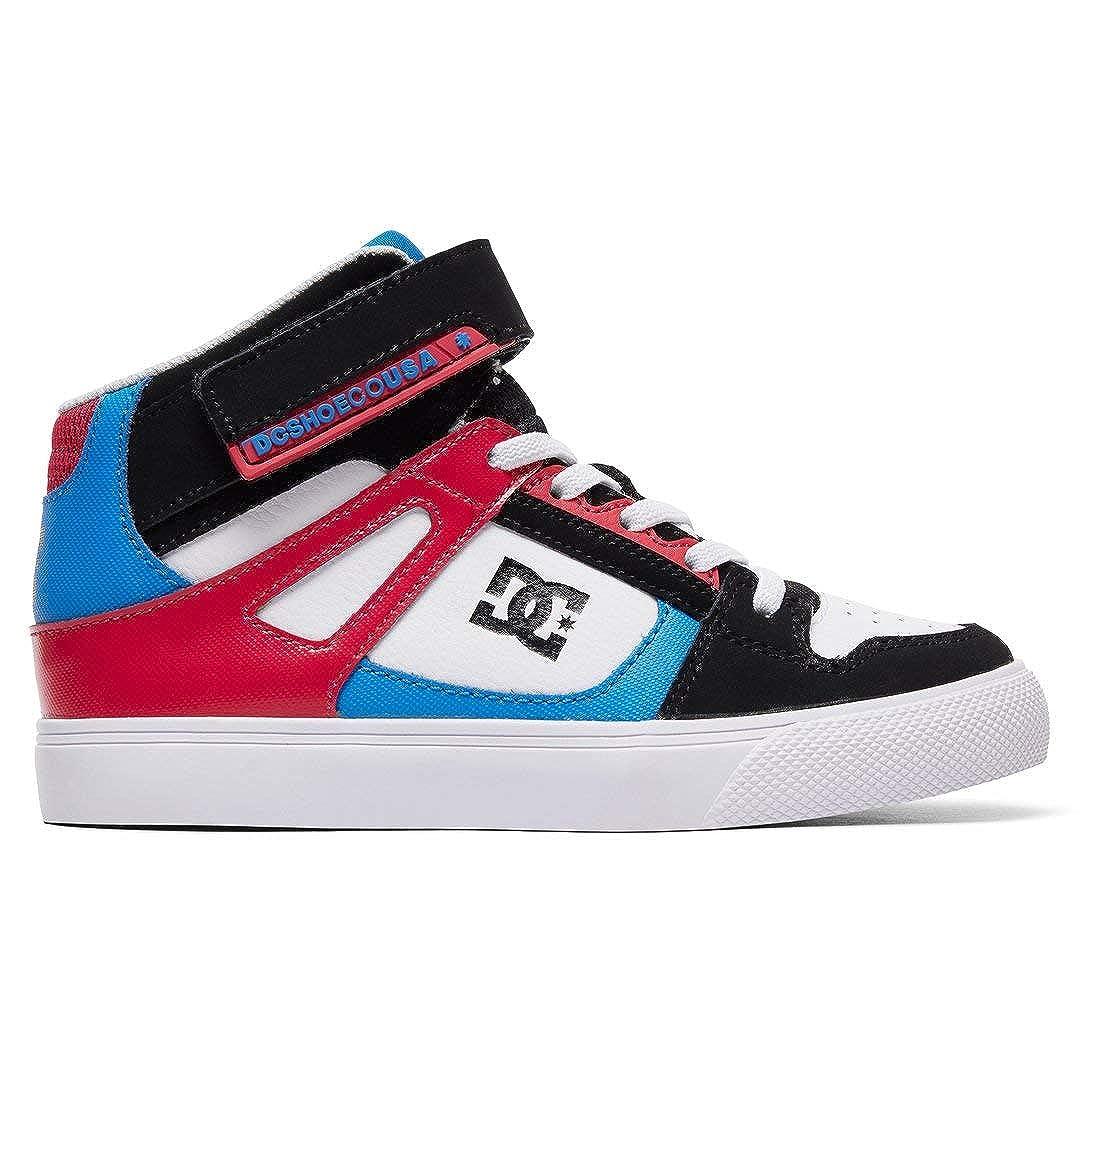 5ad77a5ac2 DC Shoes Girls Shoes Kid's Pure High Ev - High-Top Shoes Adgs300092